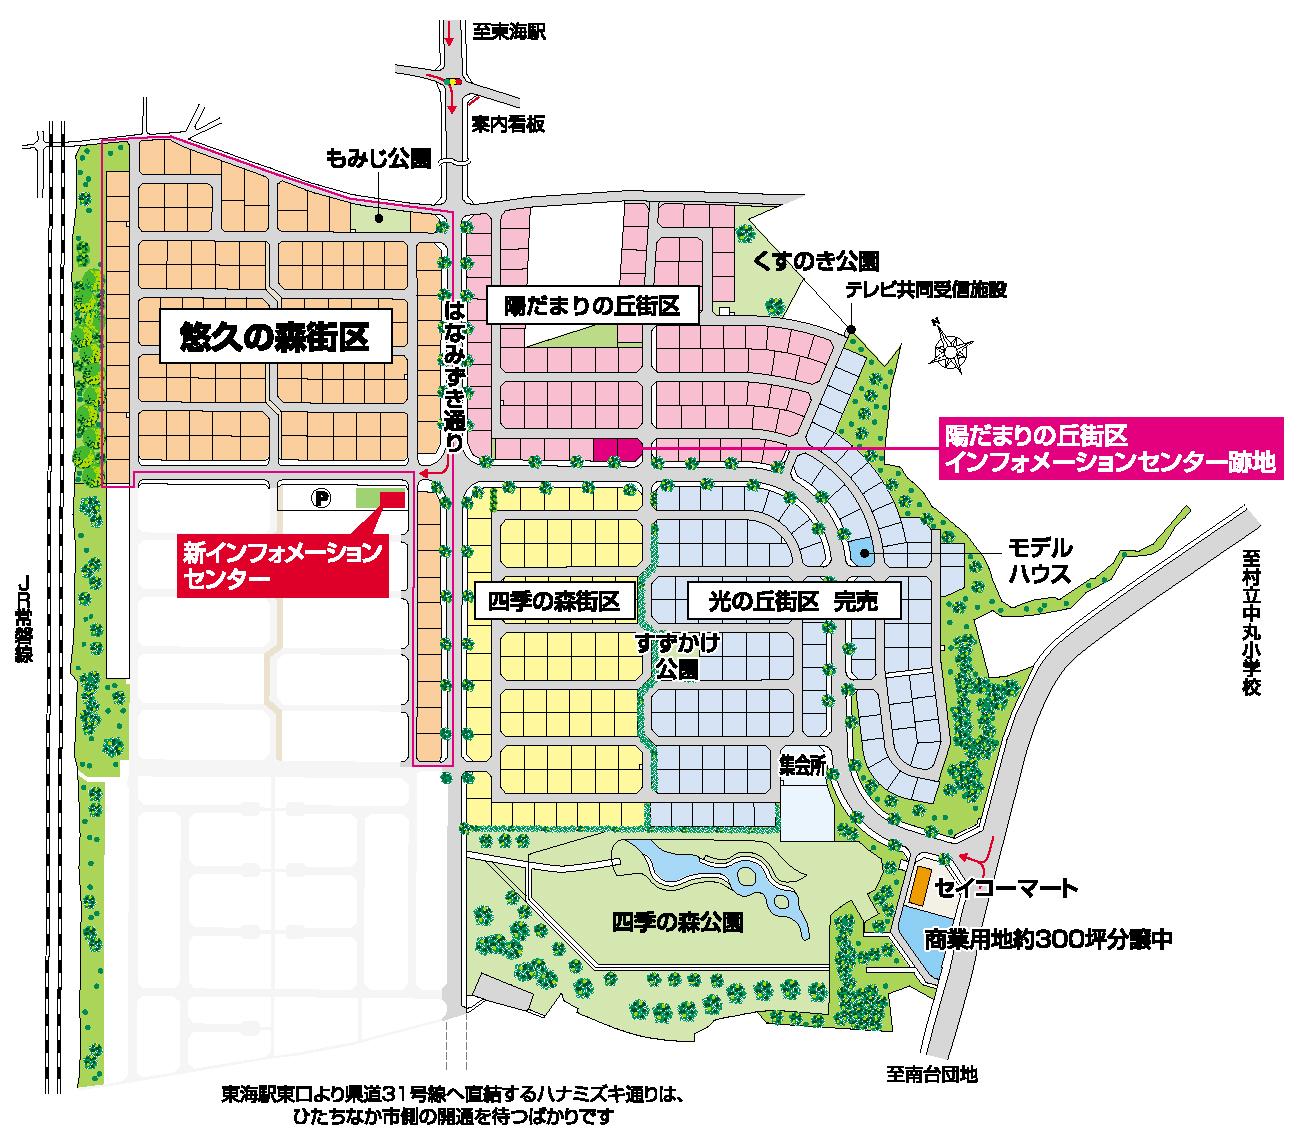 LP_全体区画図_0106 (2)